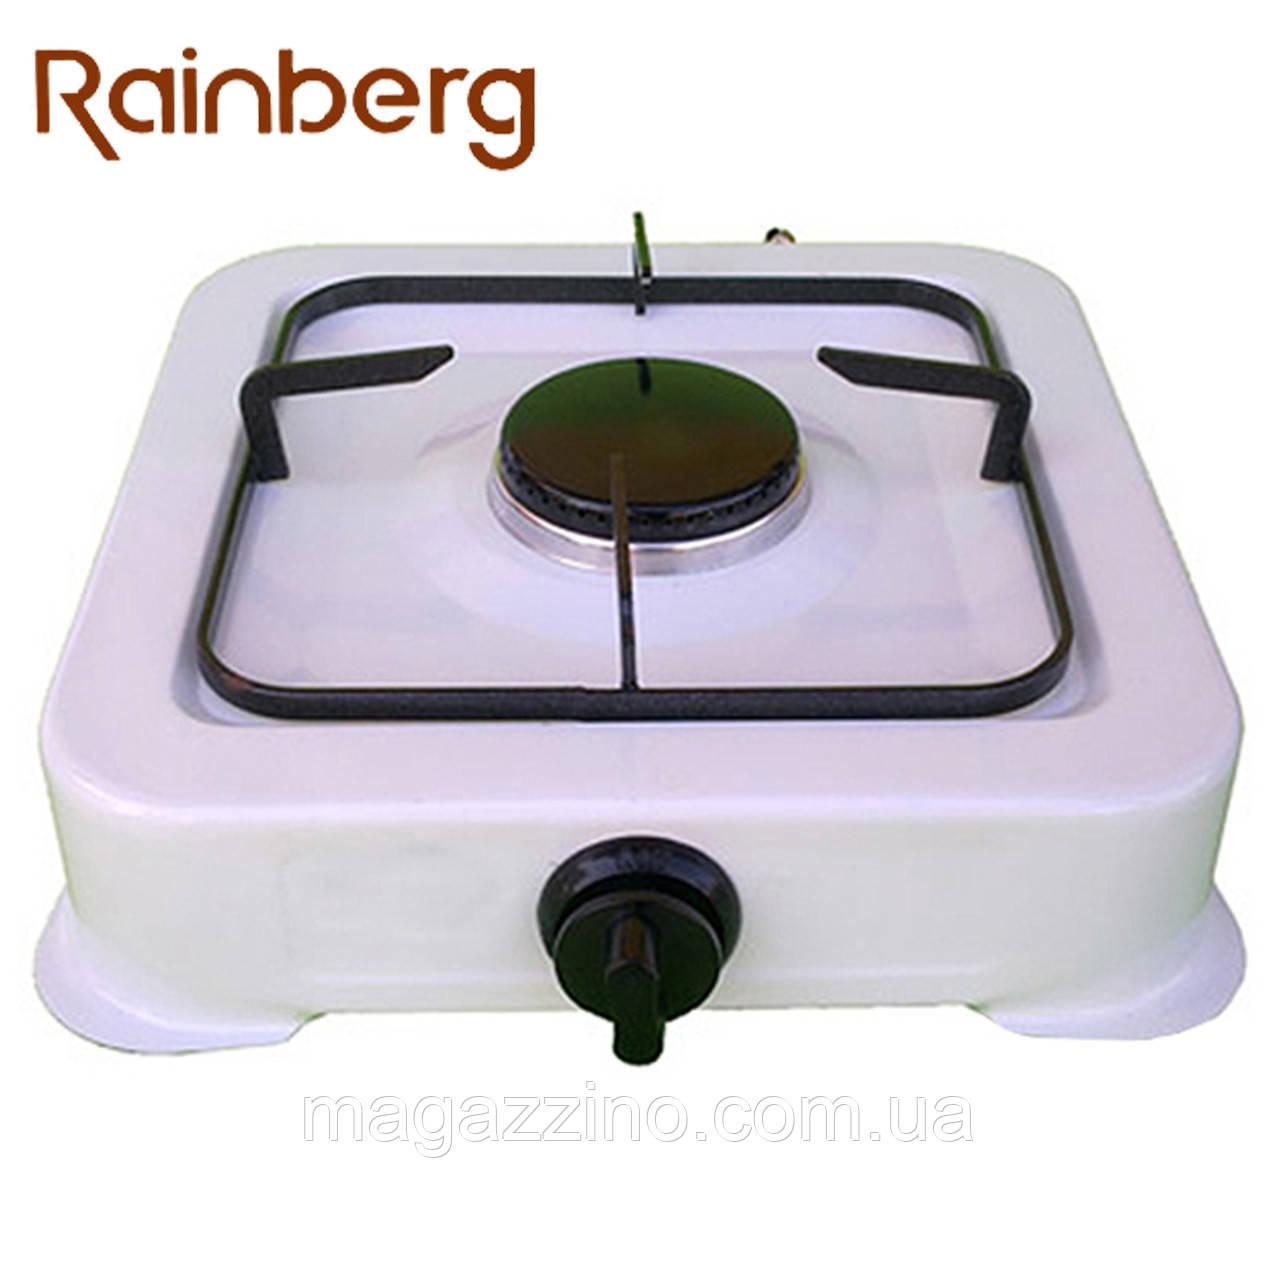 Газовая плита на 1 конфорку Rainberg RB-001